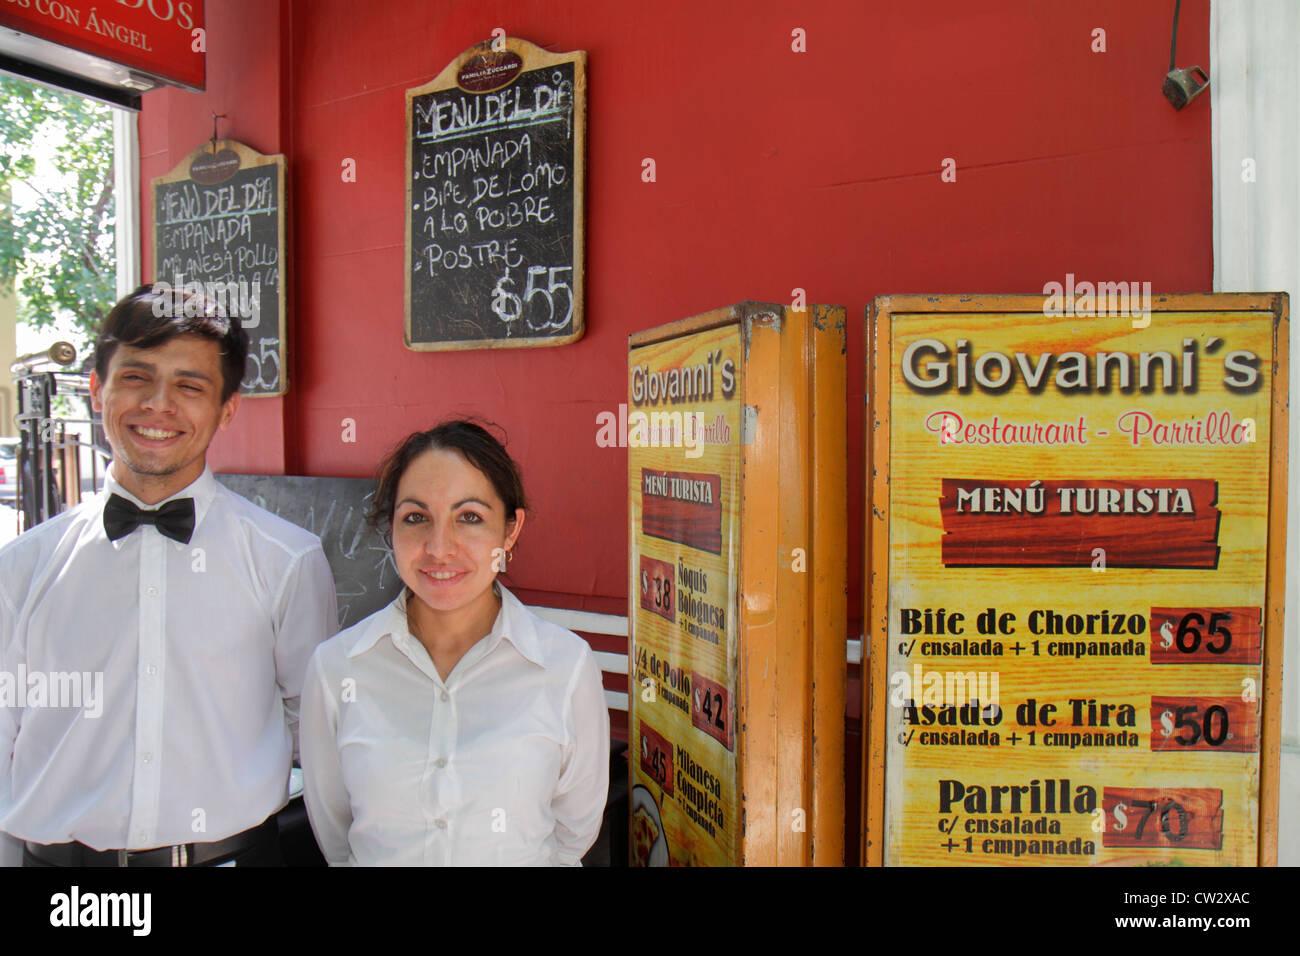 Mendoza Argentina Avenida Sarmiento Giovanni's Restaurant parrilla steak house menu price pesos currency Hispanic - Stock Image